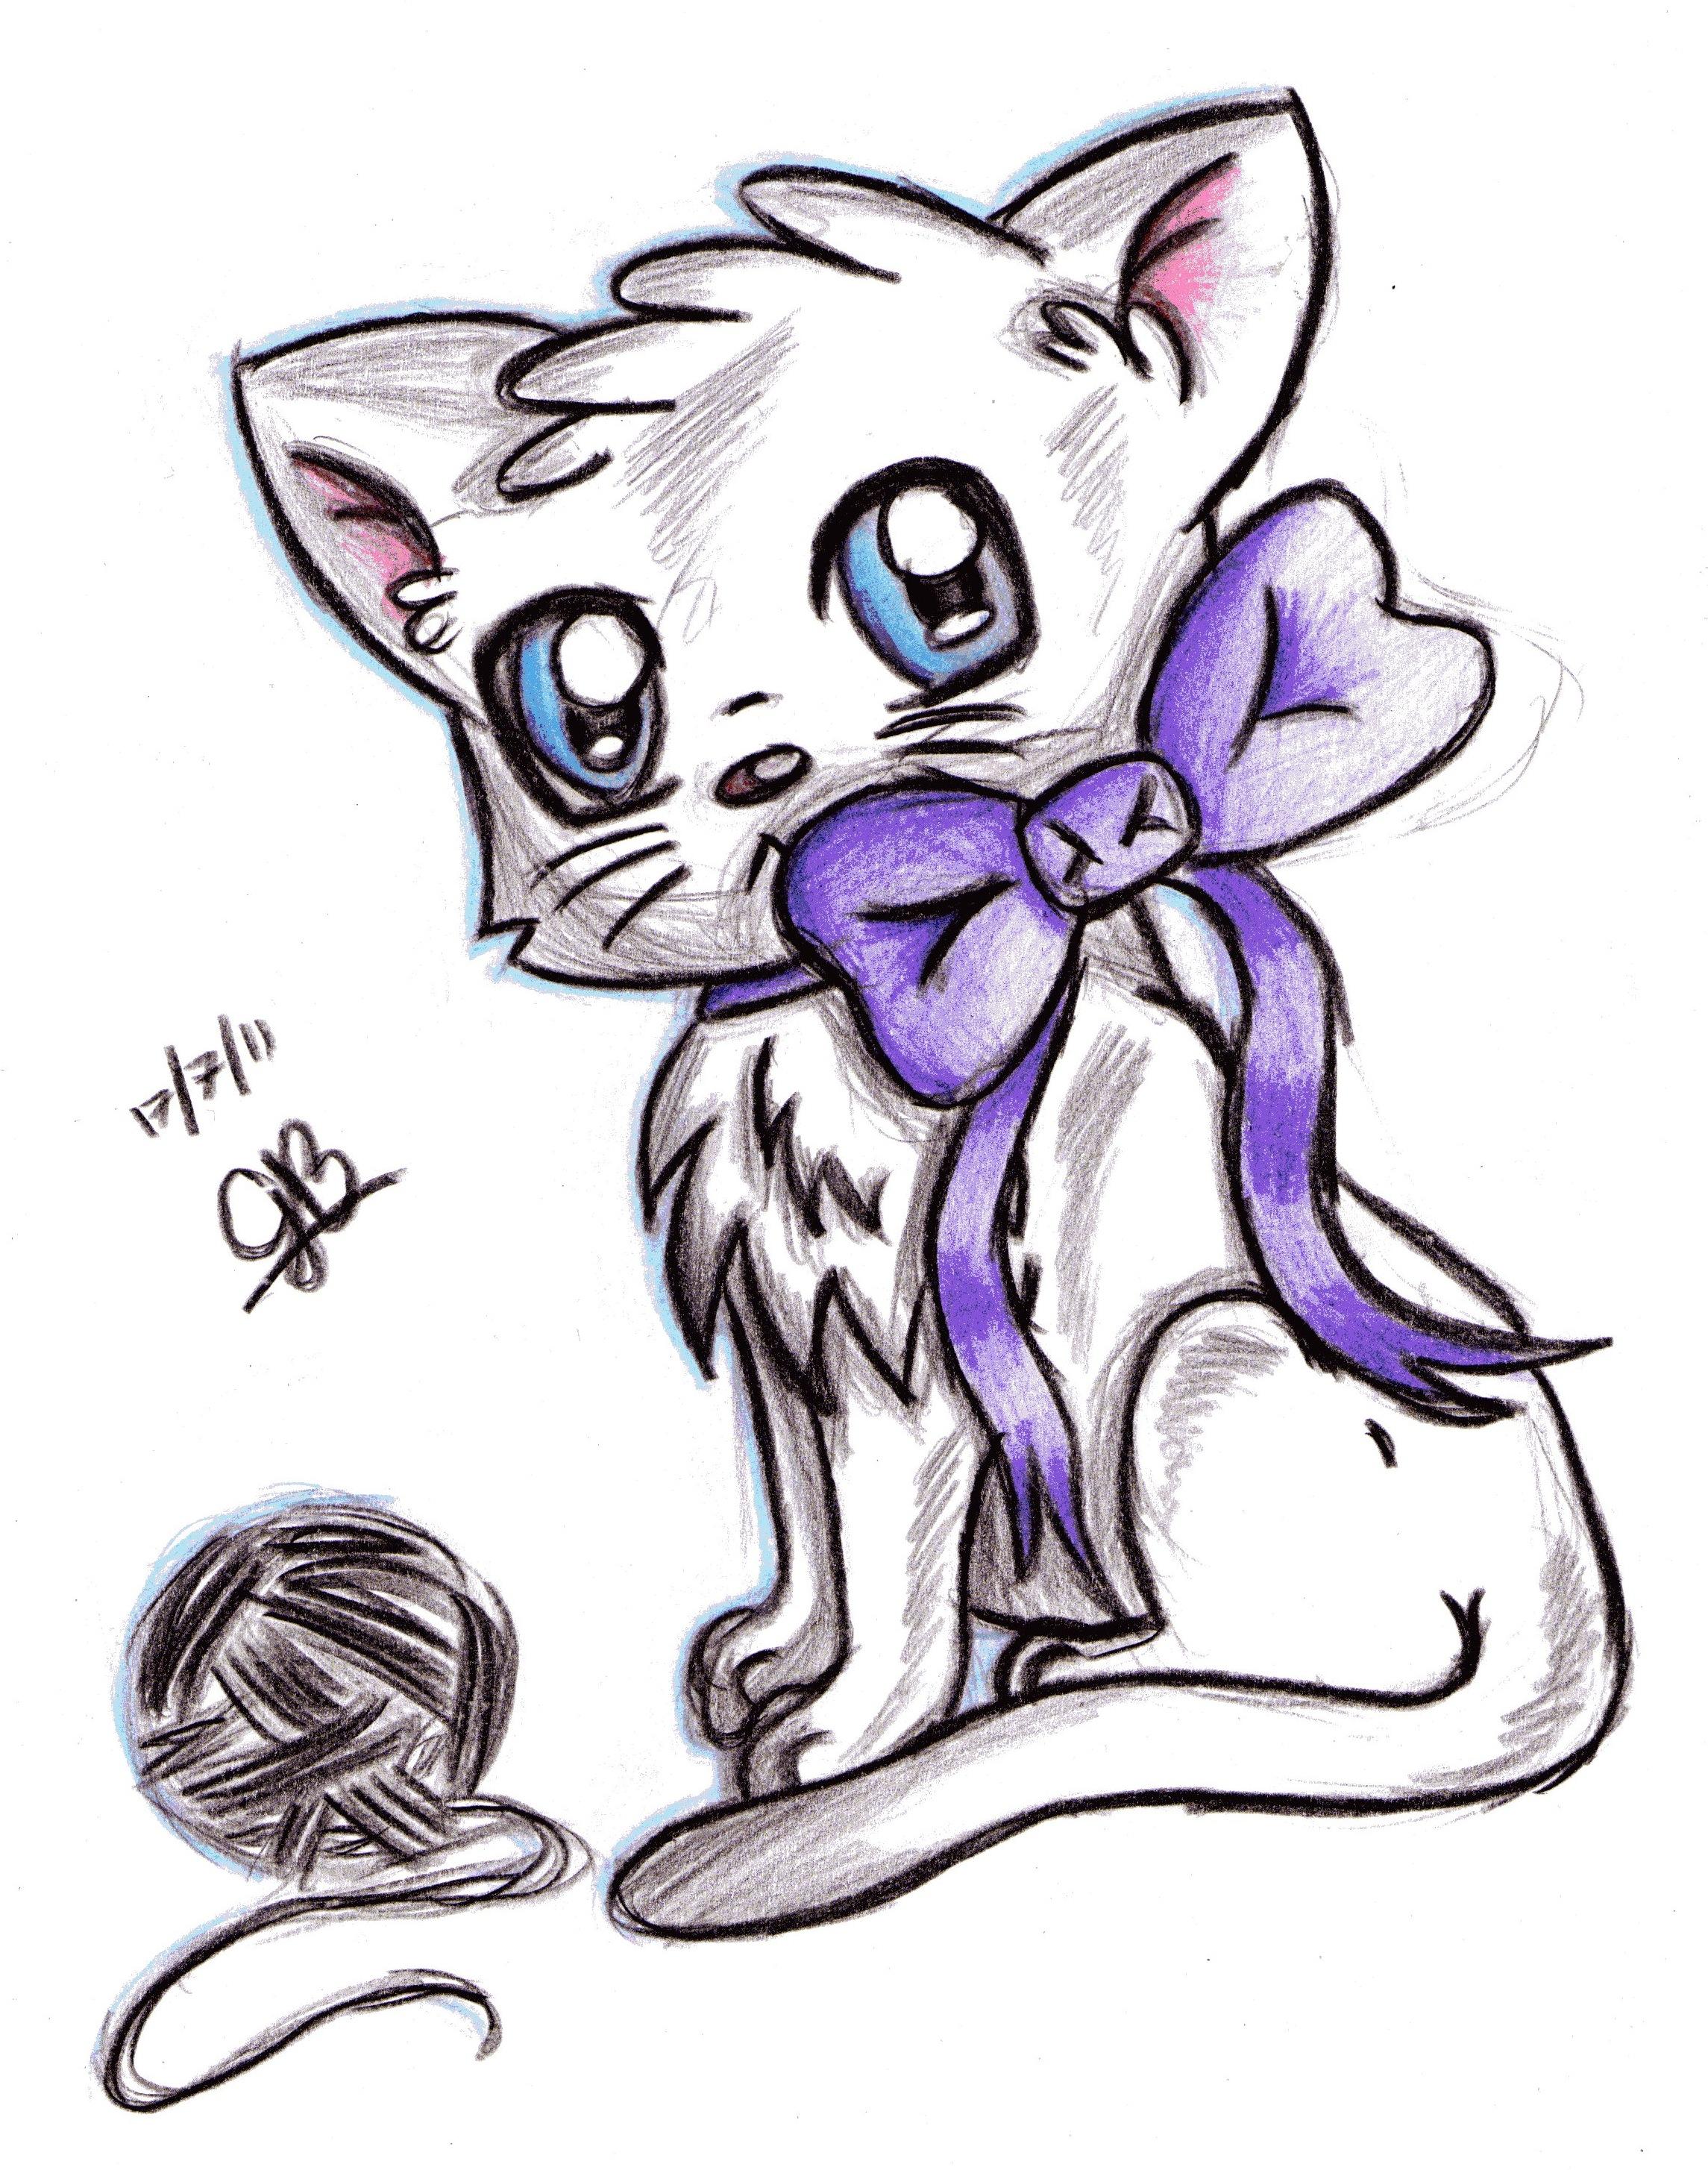 2290x2909 Drawings Of Anime Cats Drawings Of Anime Cats Anime Chibi Cat